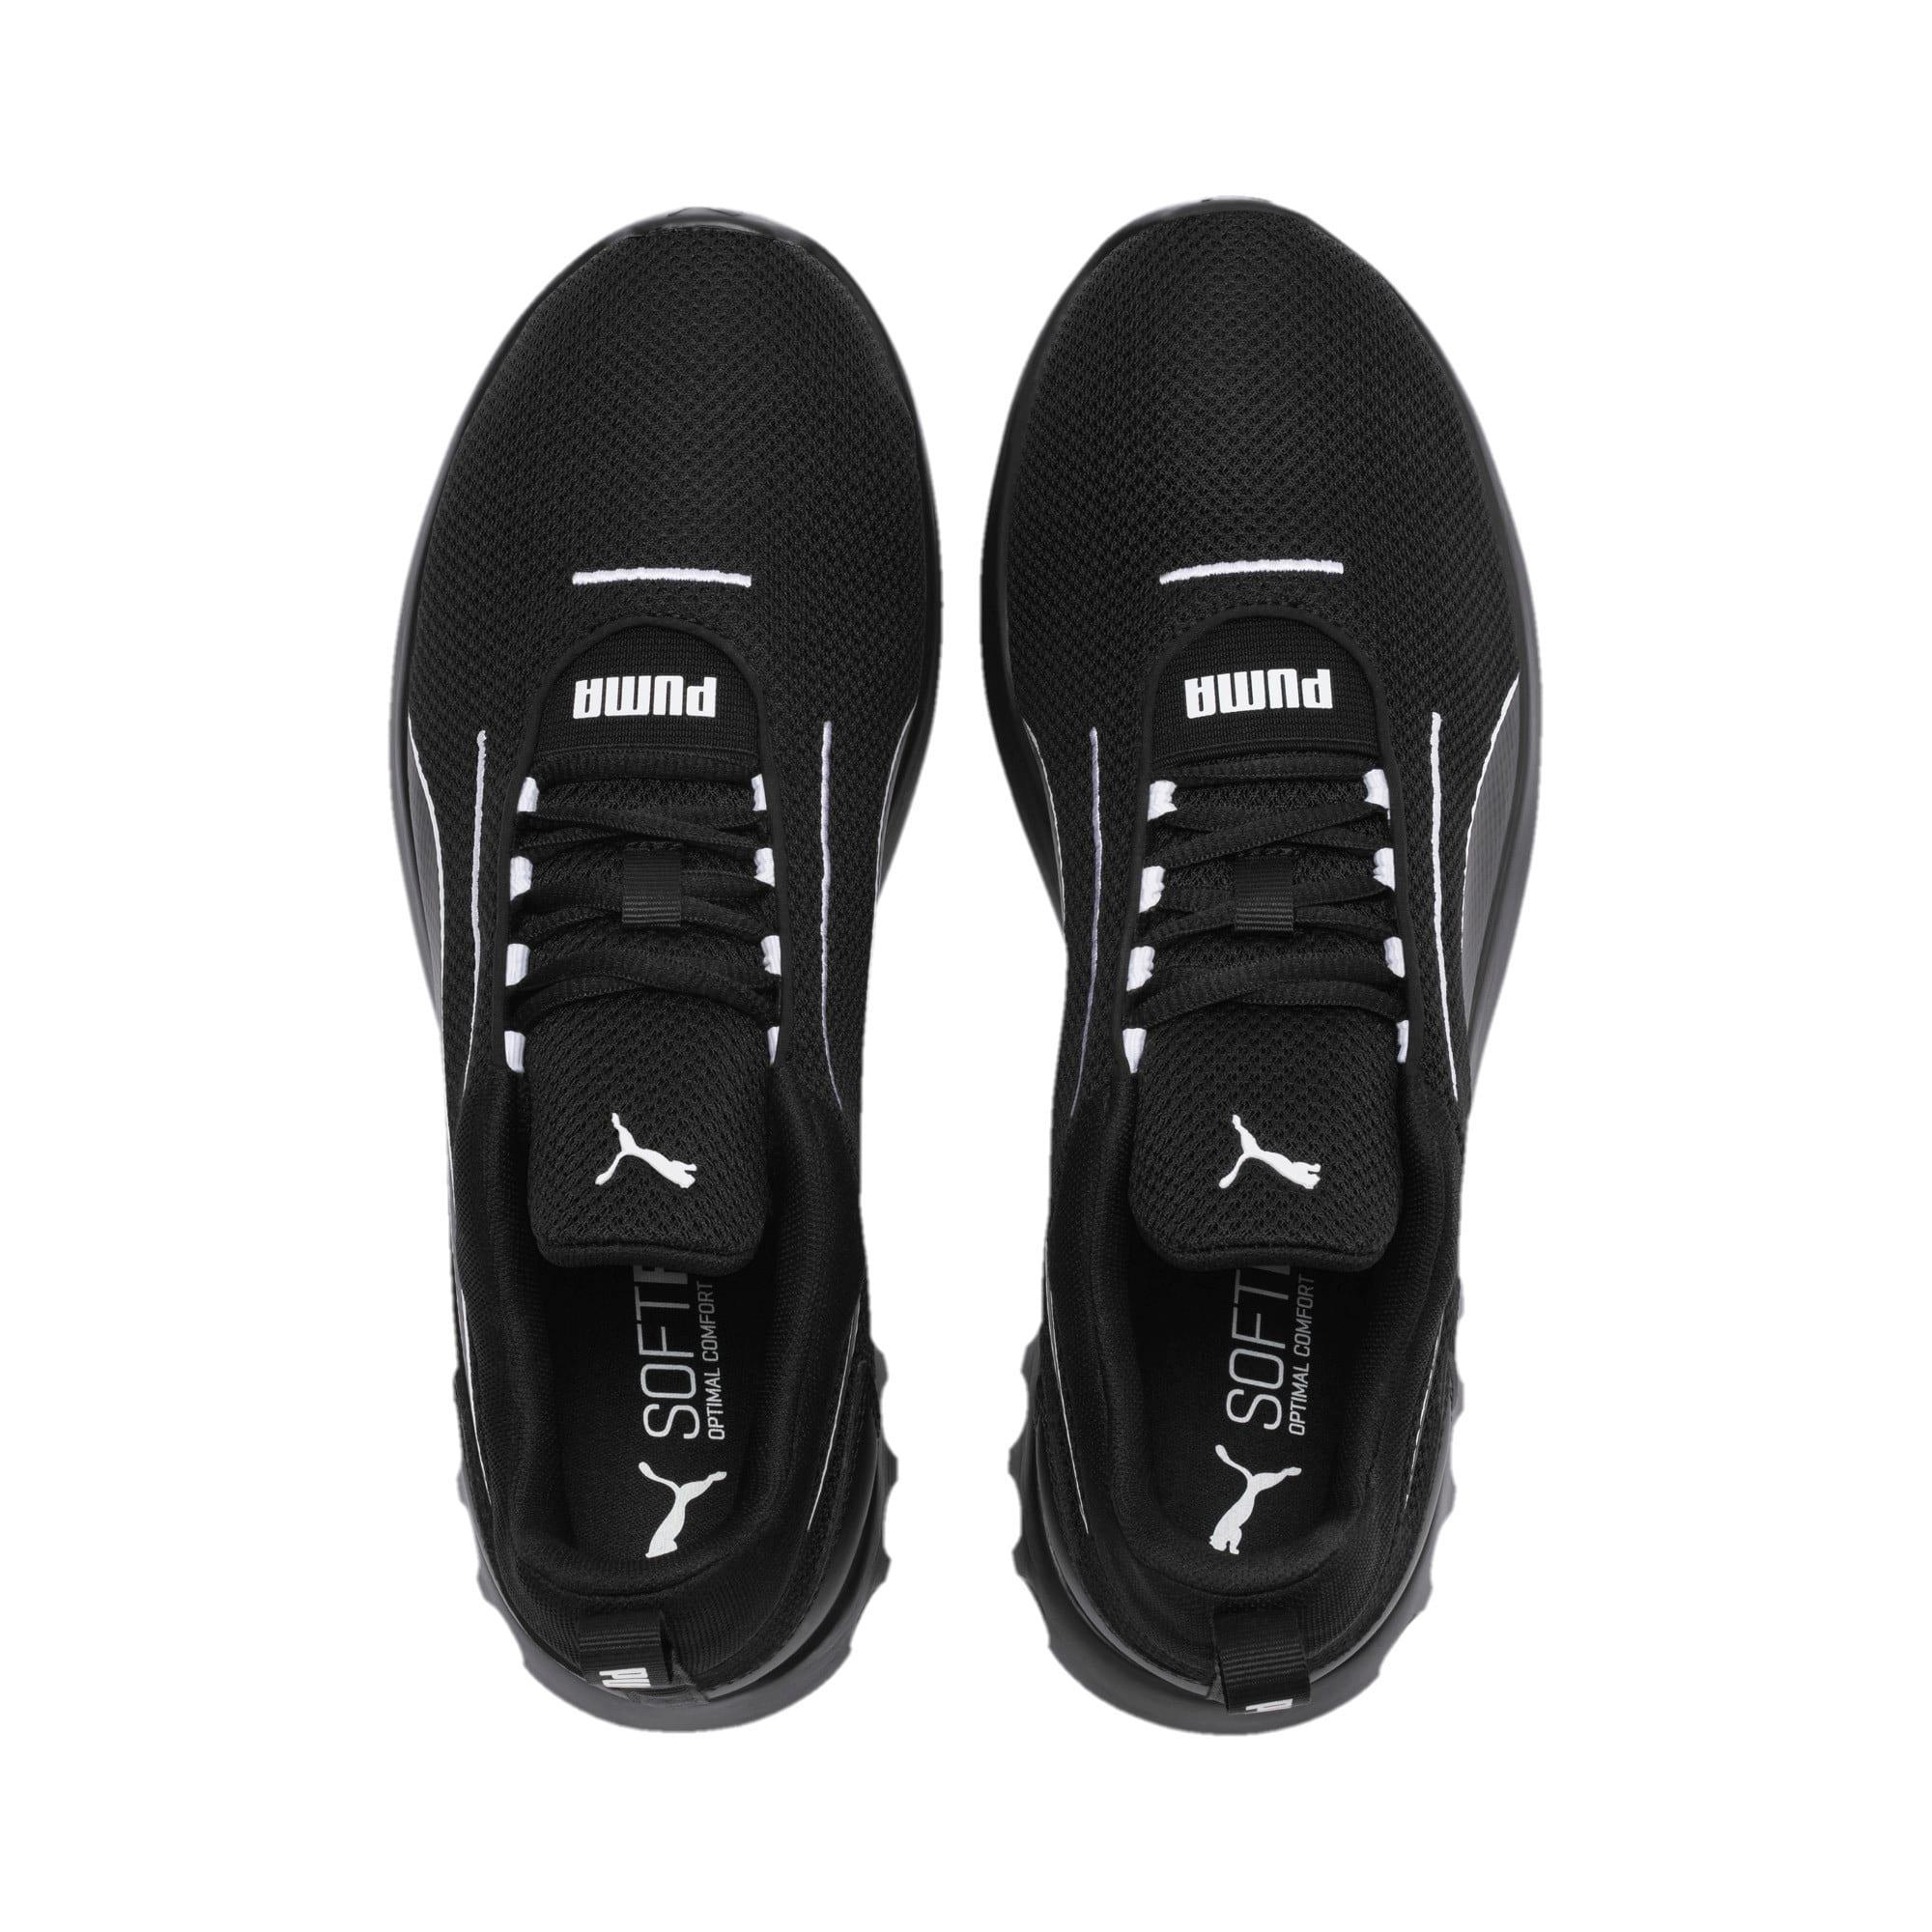 Thumbnail 6 of Carson 2 Concave Herren Sneaker, Puma Black-Puma White, medium